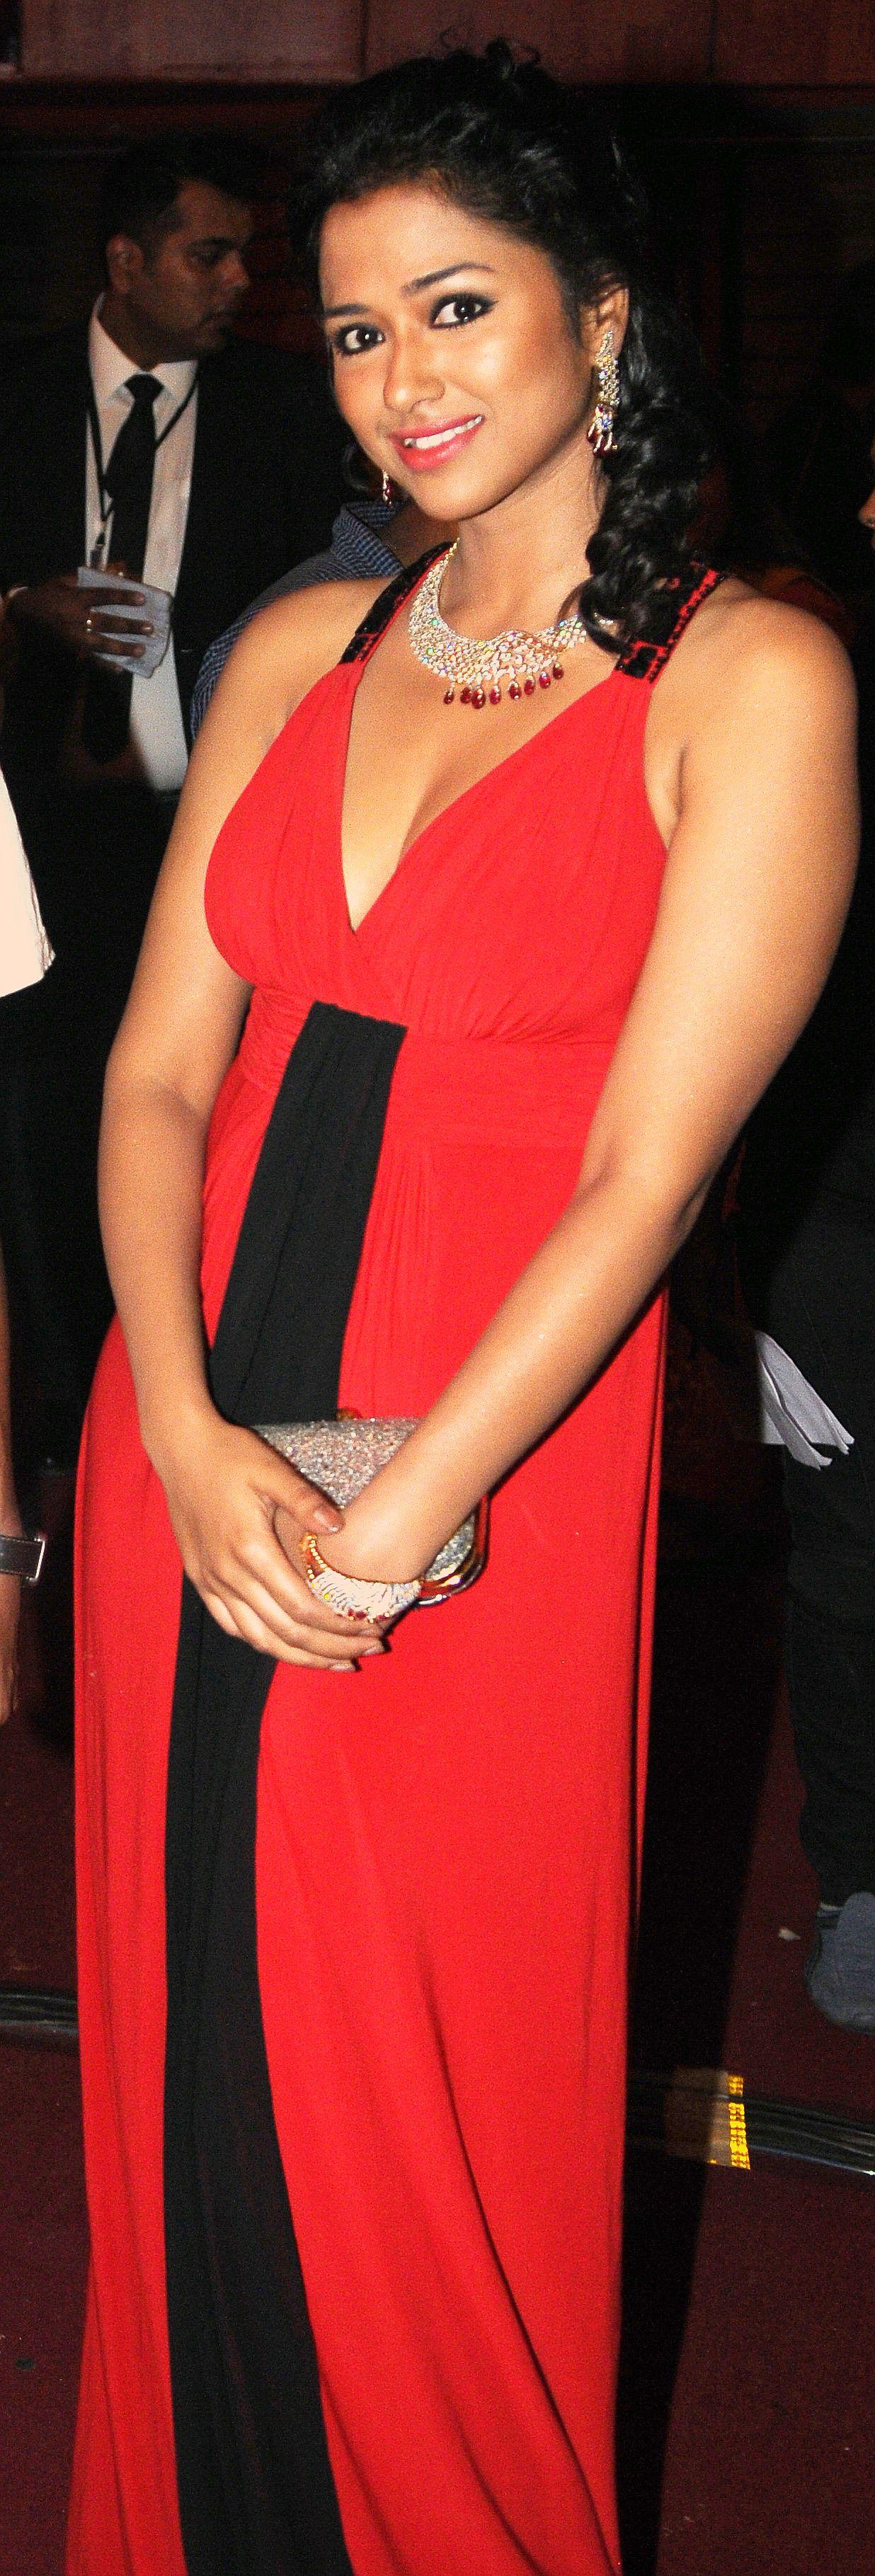 Sohini Sarkar presents at the 1st Vivel Filmfare Awards 2013 (East) at Science City auditorium in Kolkata